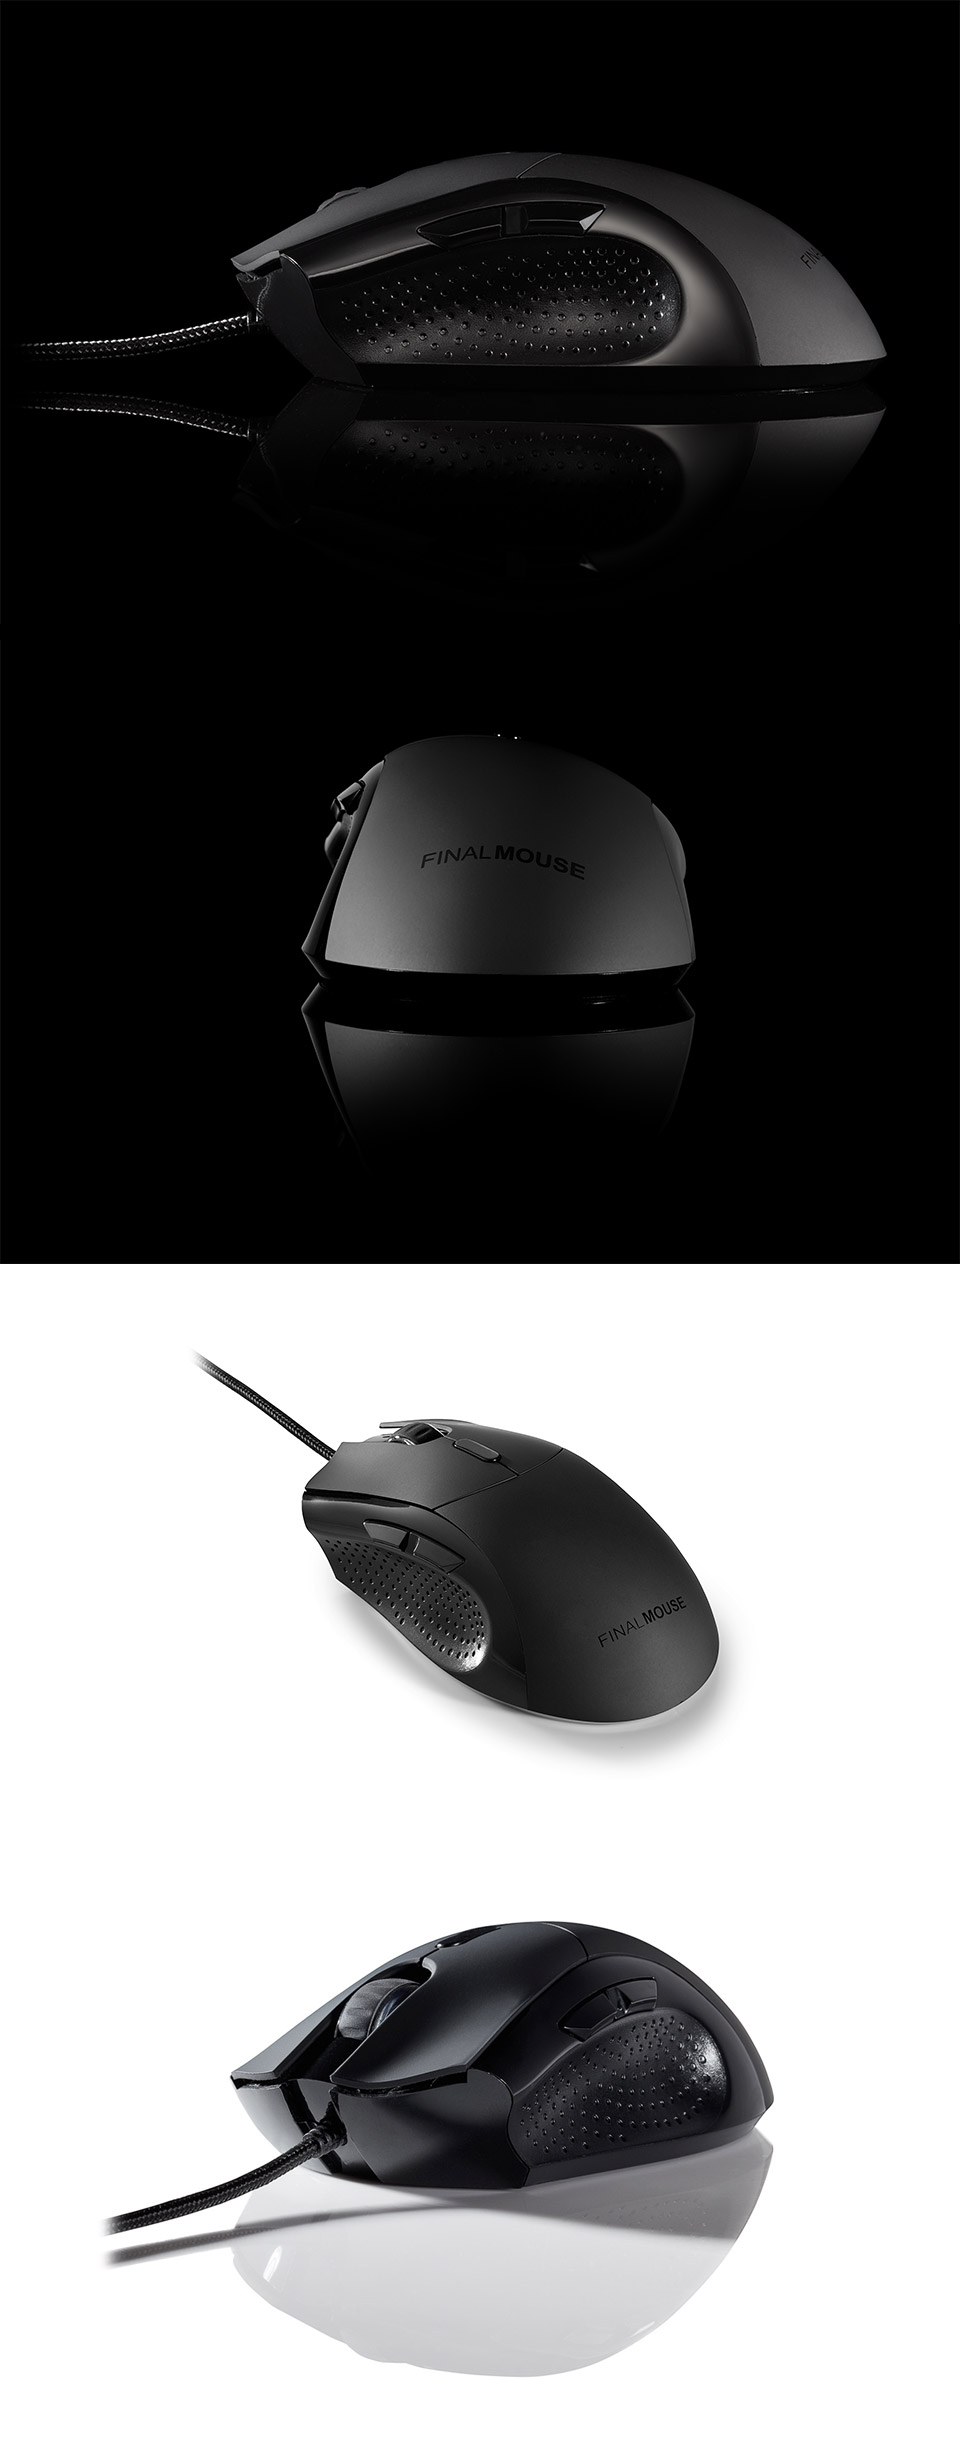 d2d11dcb05d Finalmouse Classic Ergo 2 Gaming Mouse Black [FM-CLASSIC-ERGO-2 ...